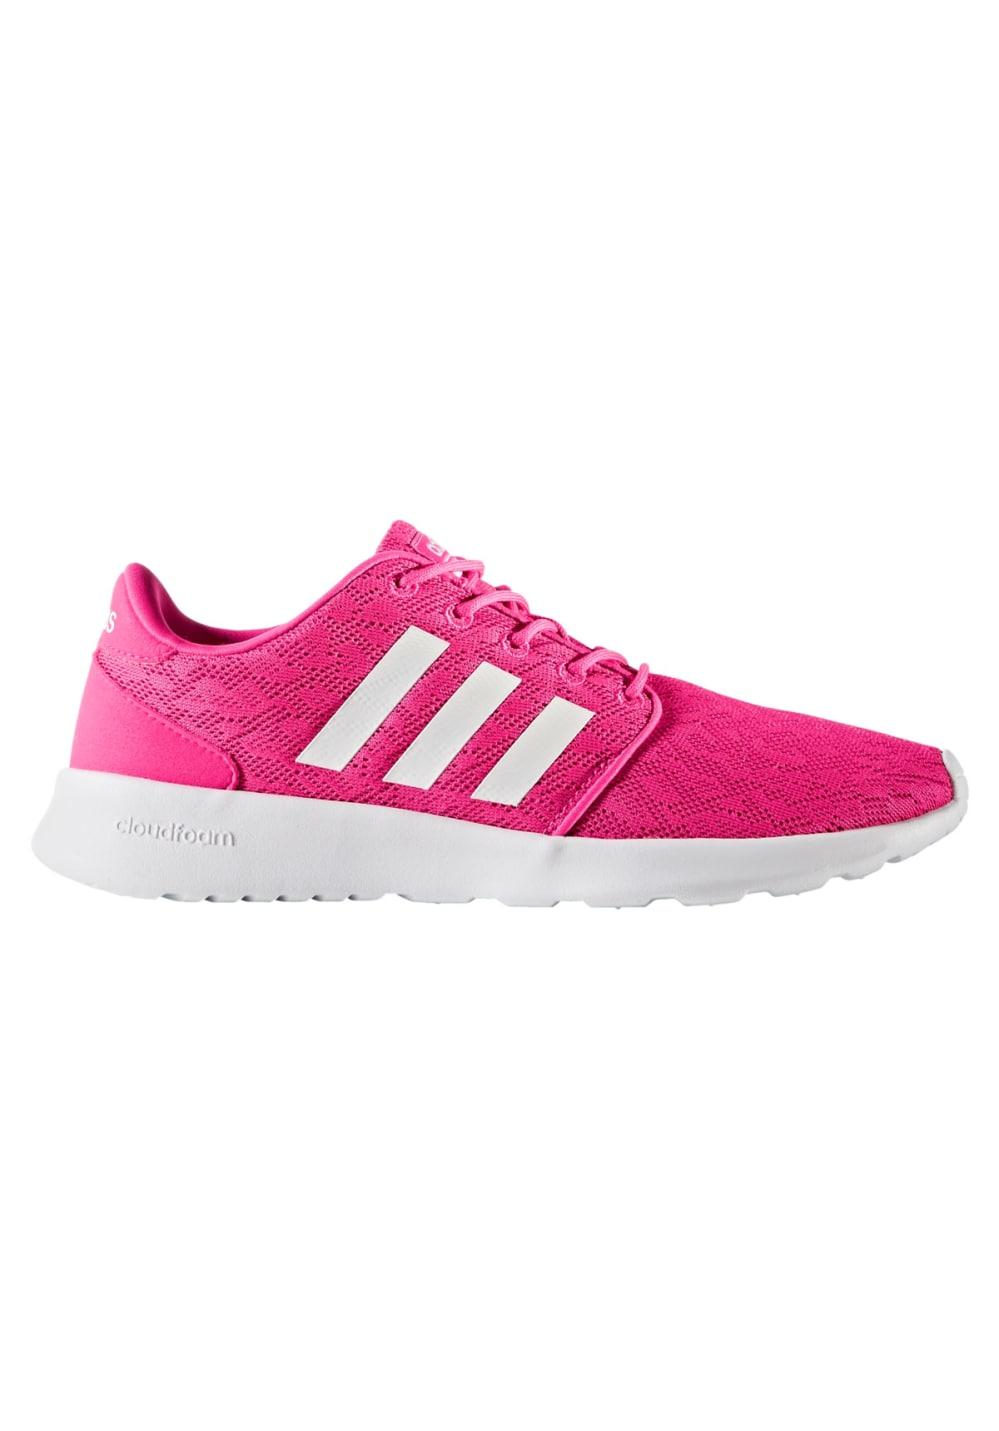 21a69b710caa Adidas Neo Cloudfoam Qt Racer Pink Adidas Women s Cloudfoam Qt Racer ...